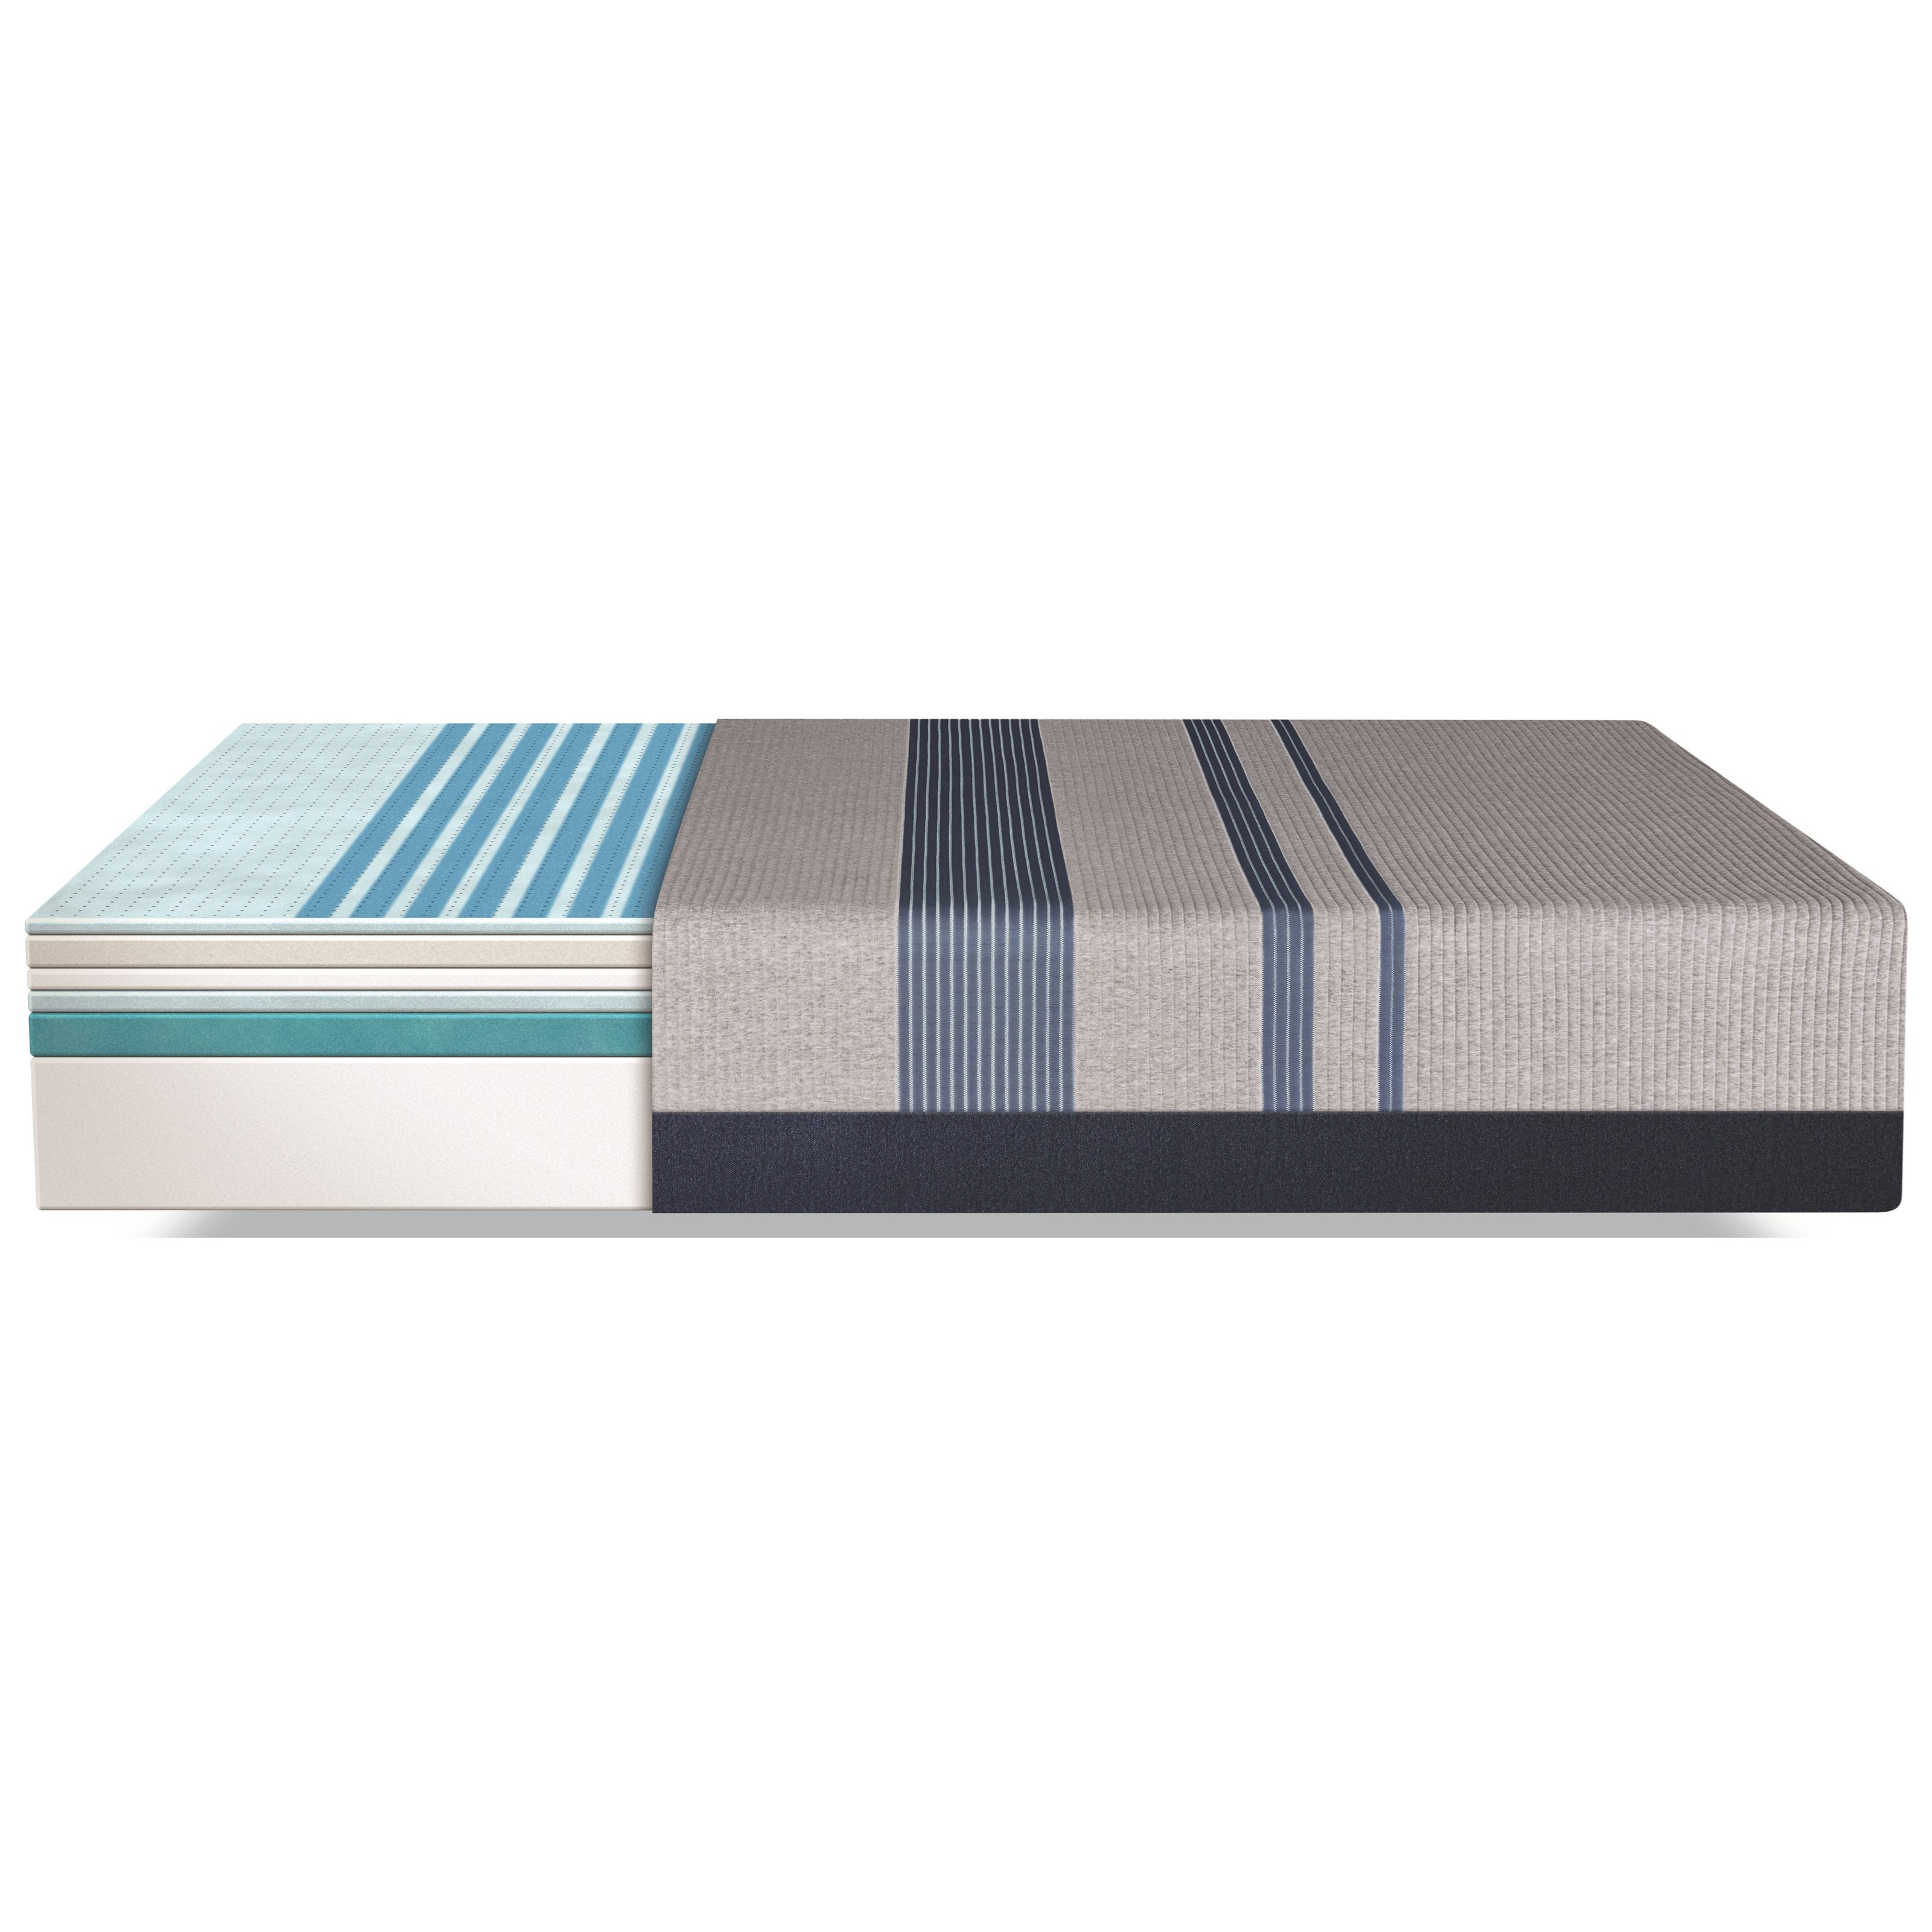 Serta Icomfort Blue Max 1000 Cushion Firm 500801268 1050